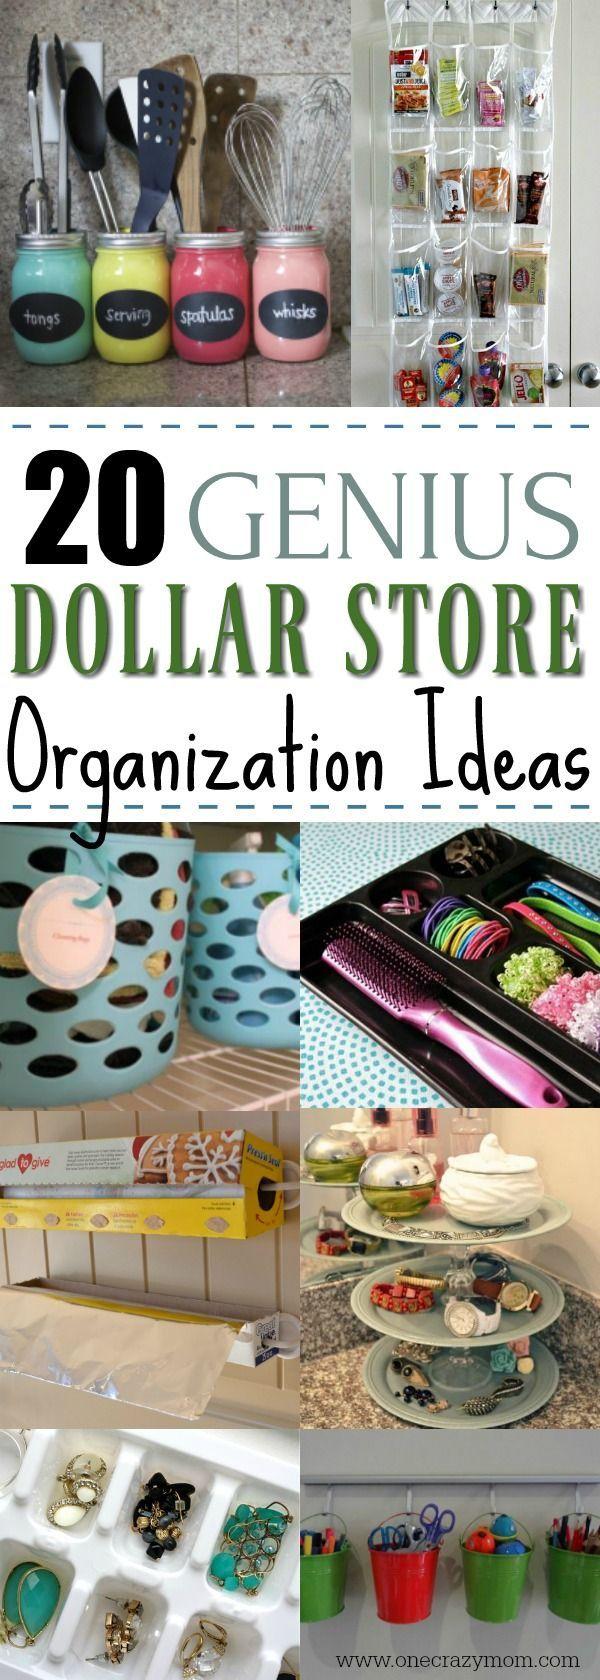 Dollar Store Home Organization Ideas 20